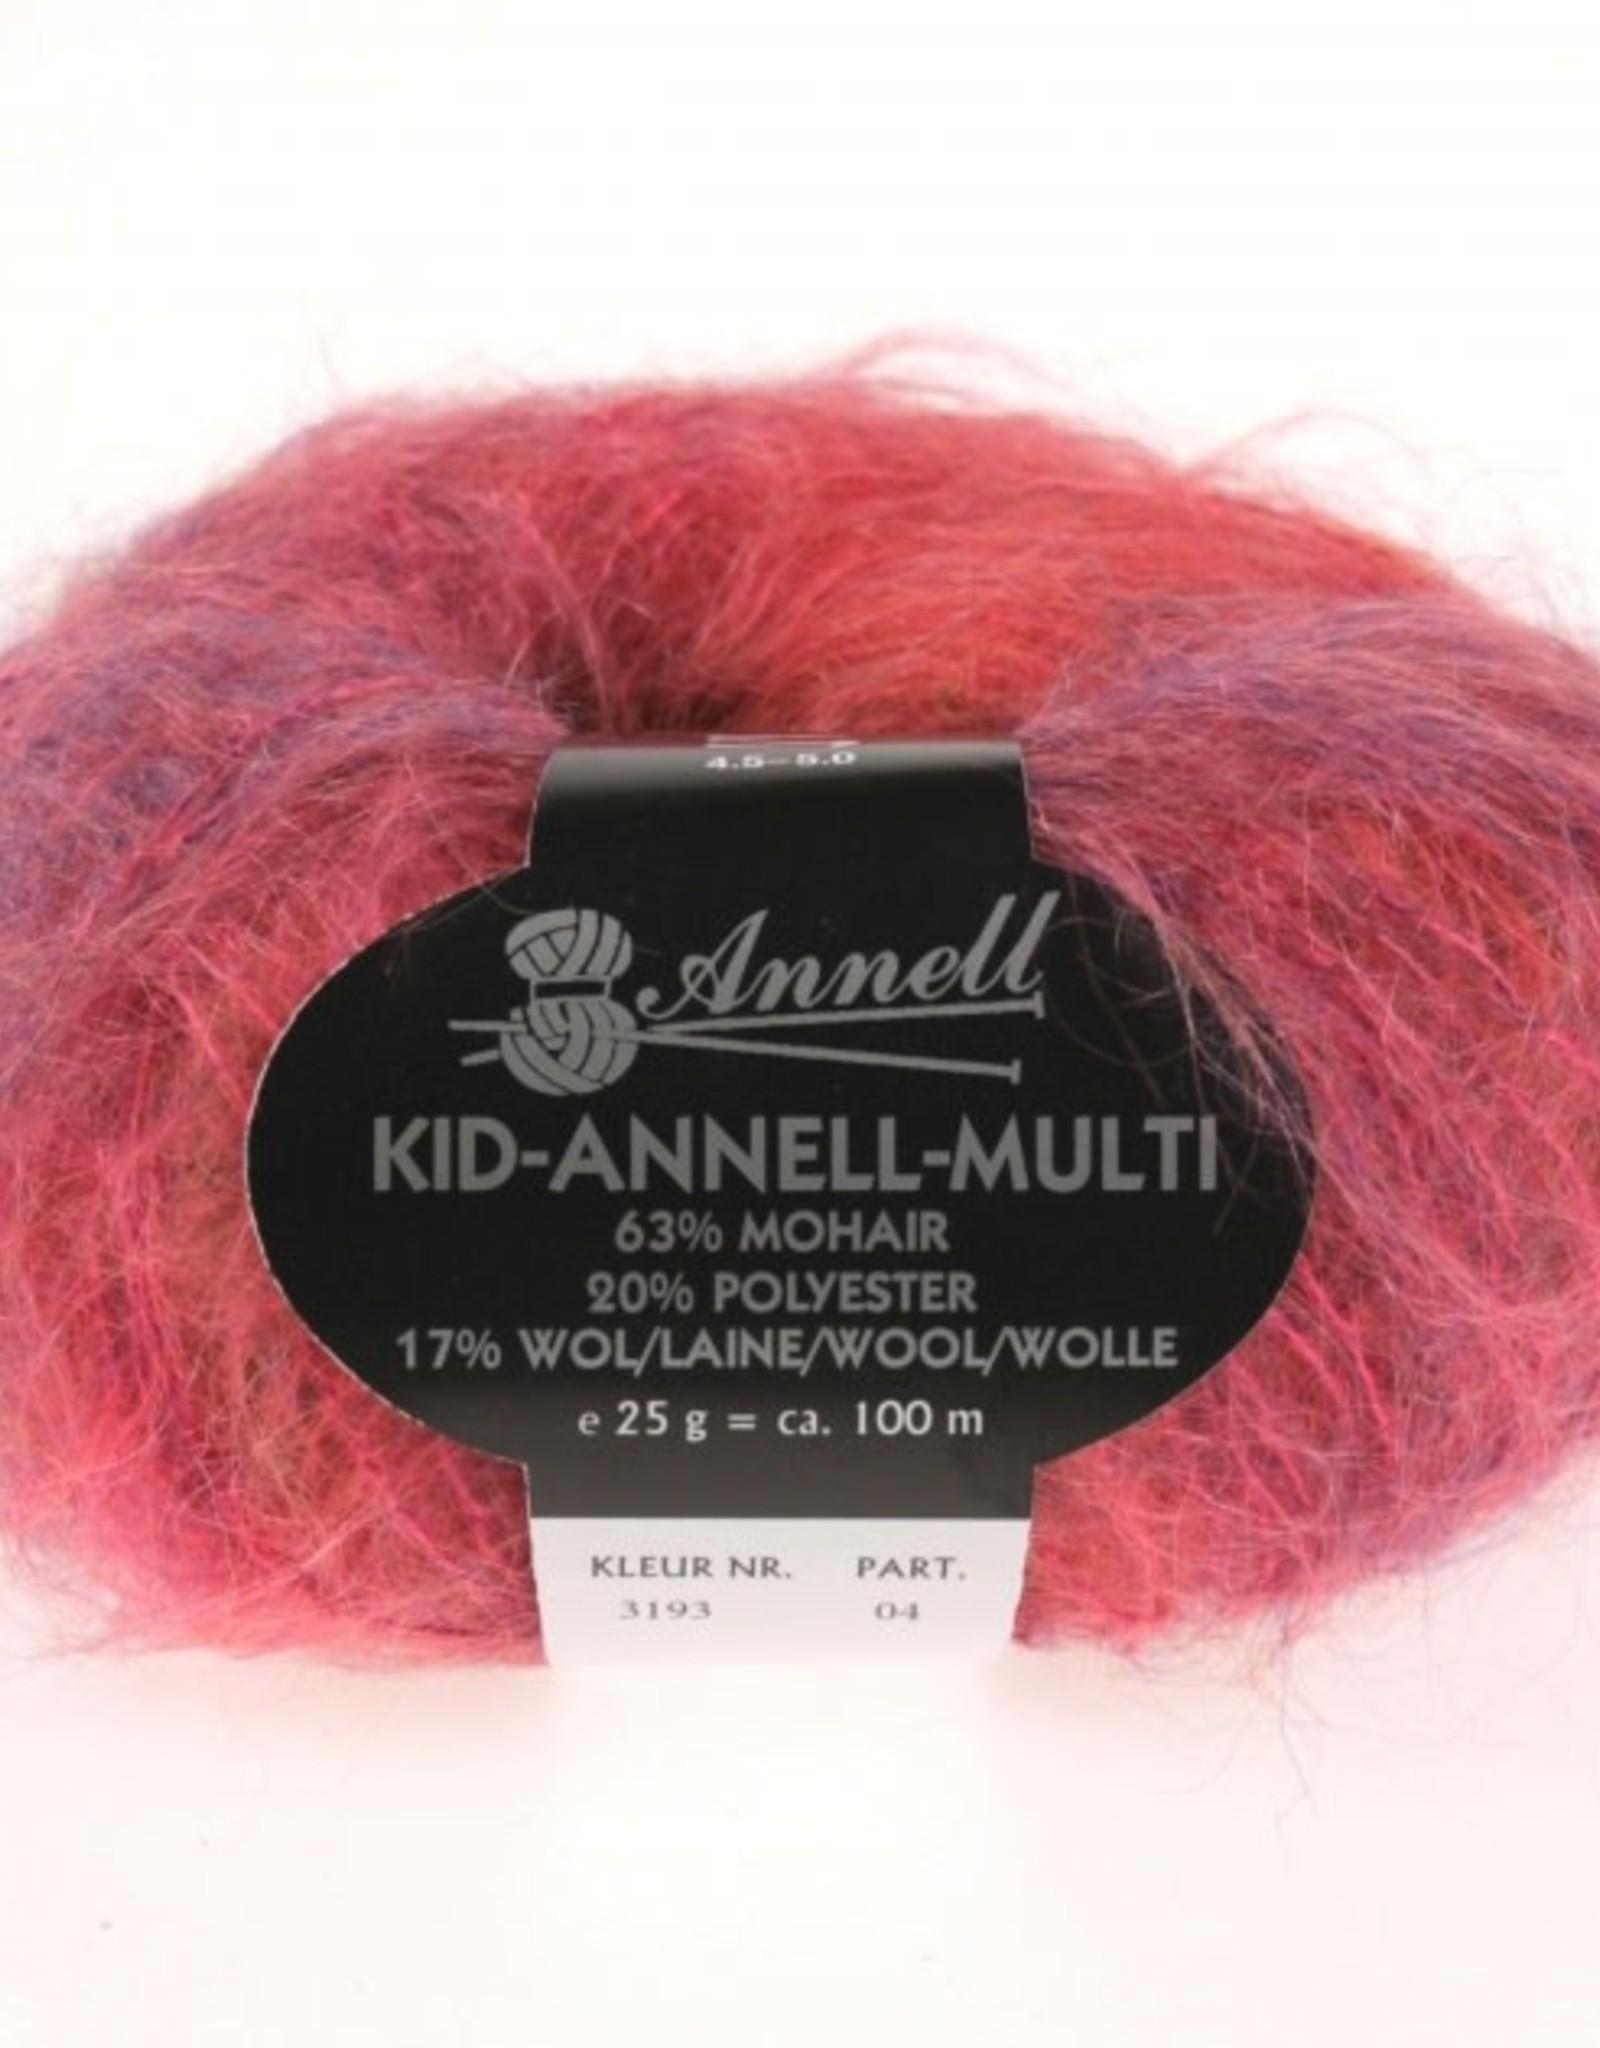 Annell Annell Kid Annell multi 3193